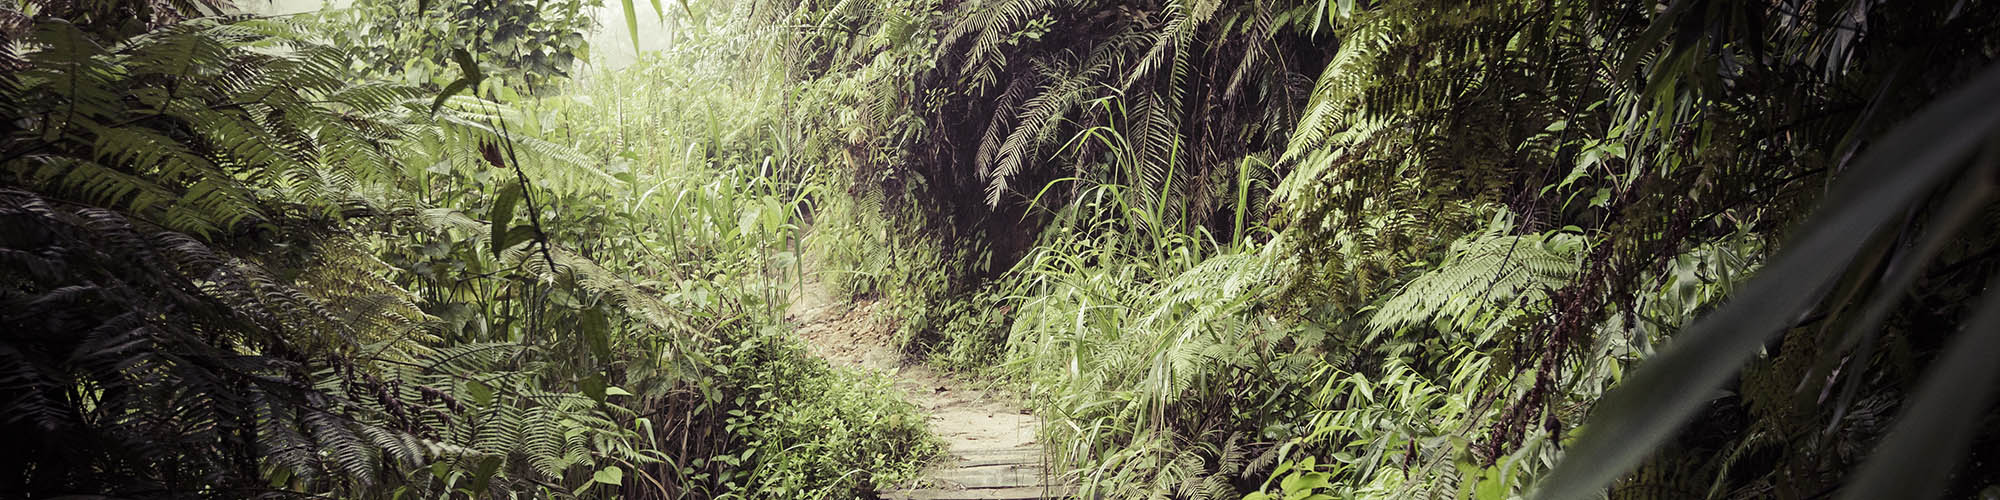 Regenwald, Sinharaja, Sri Lanka